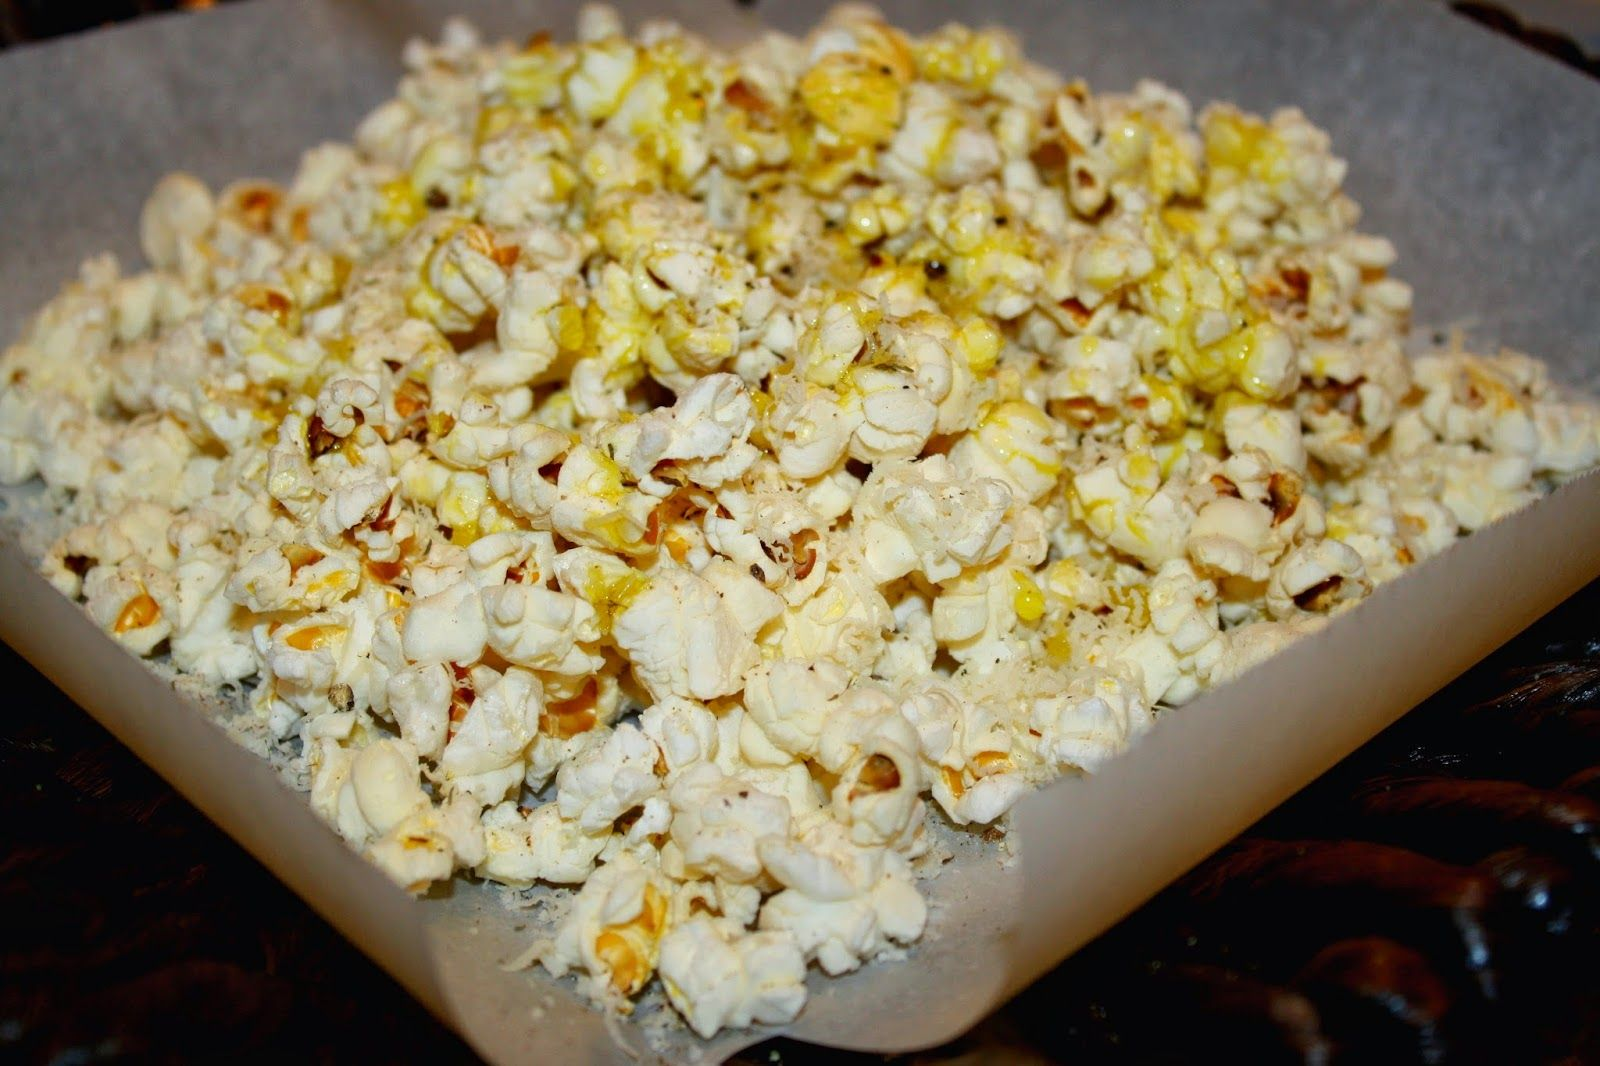 infusemeinc powerhousemallshopping yummy cooking popcornlovers popcorn hanover lebanon uppervalley boston